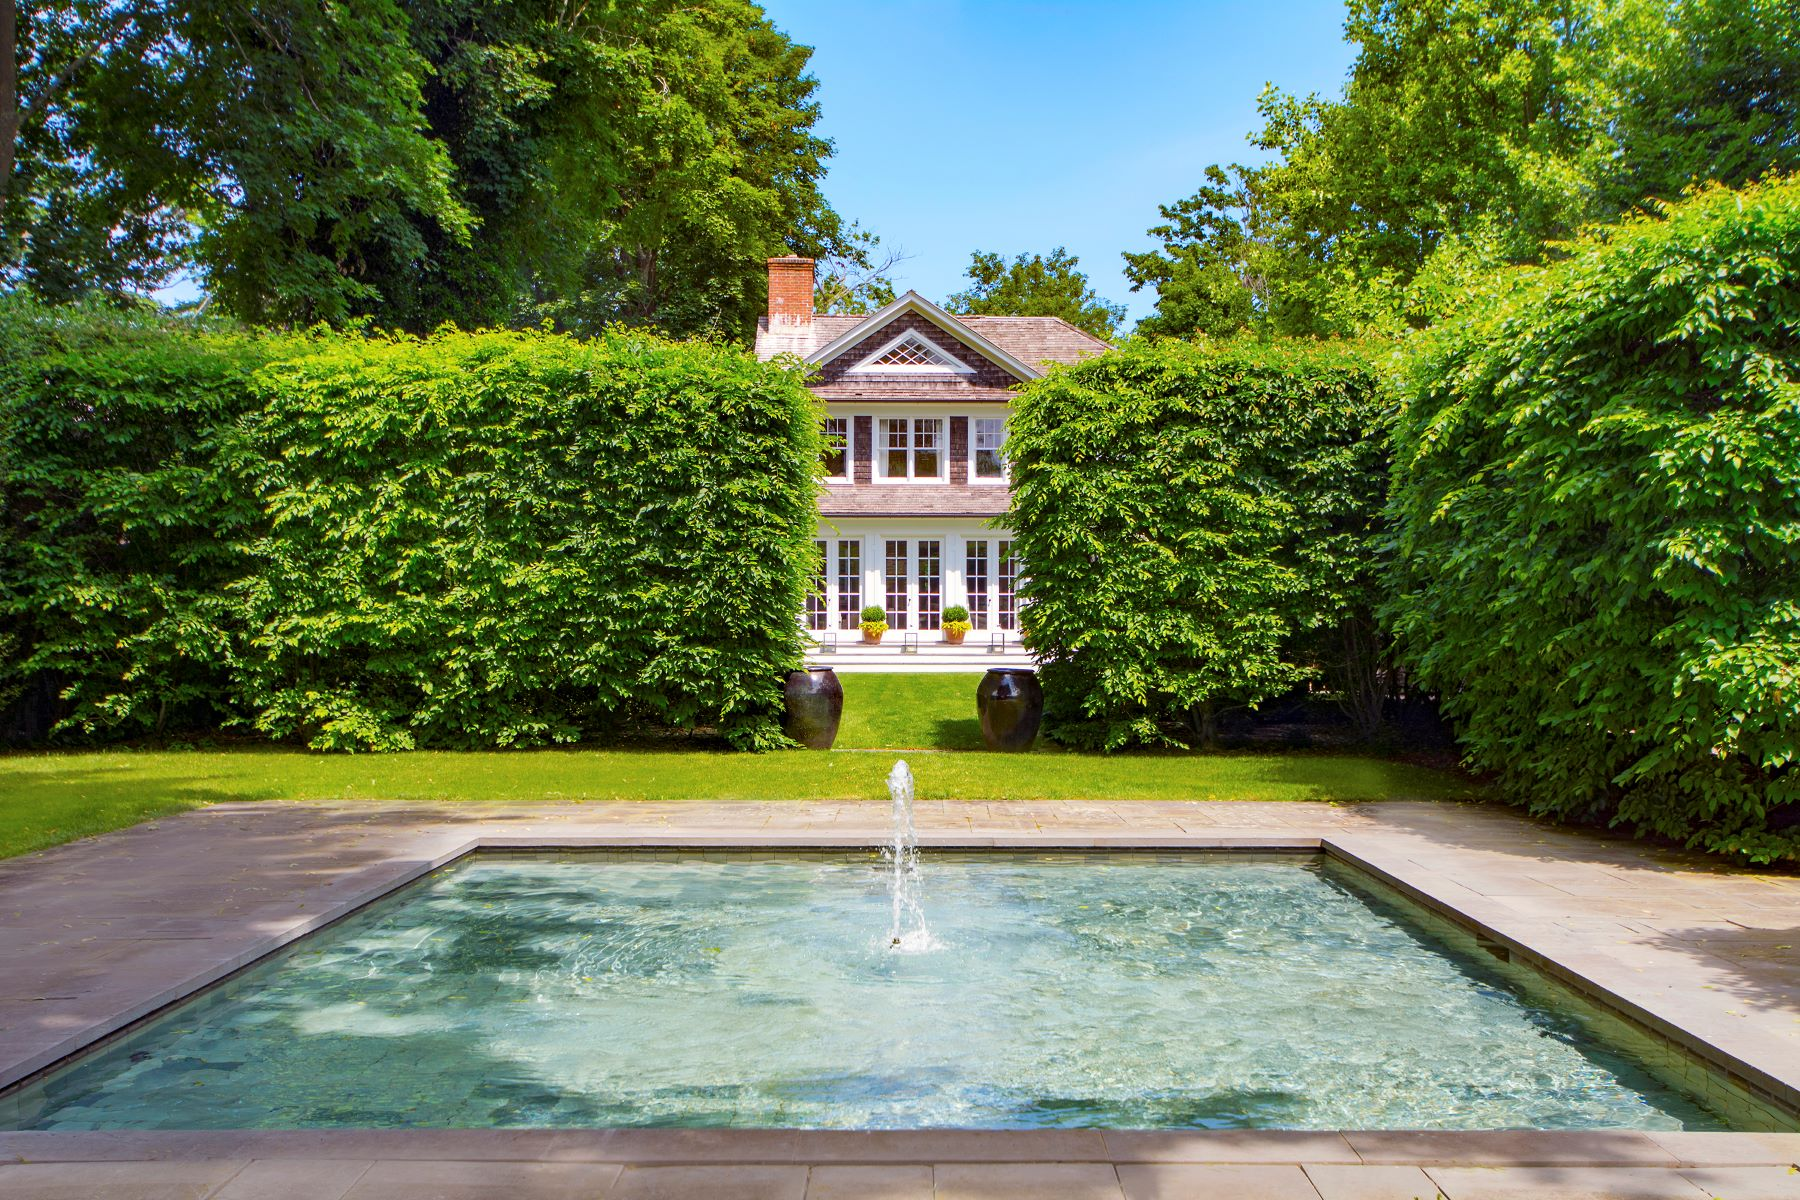 Single Family Homes for Sale at Estate-Feel in Heart of Bridgehampton 177 Maple Lane Bridgehampton, New York 11932 United States